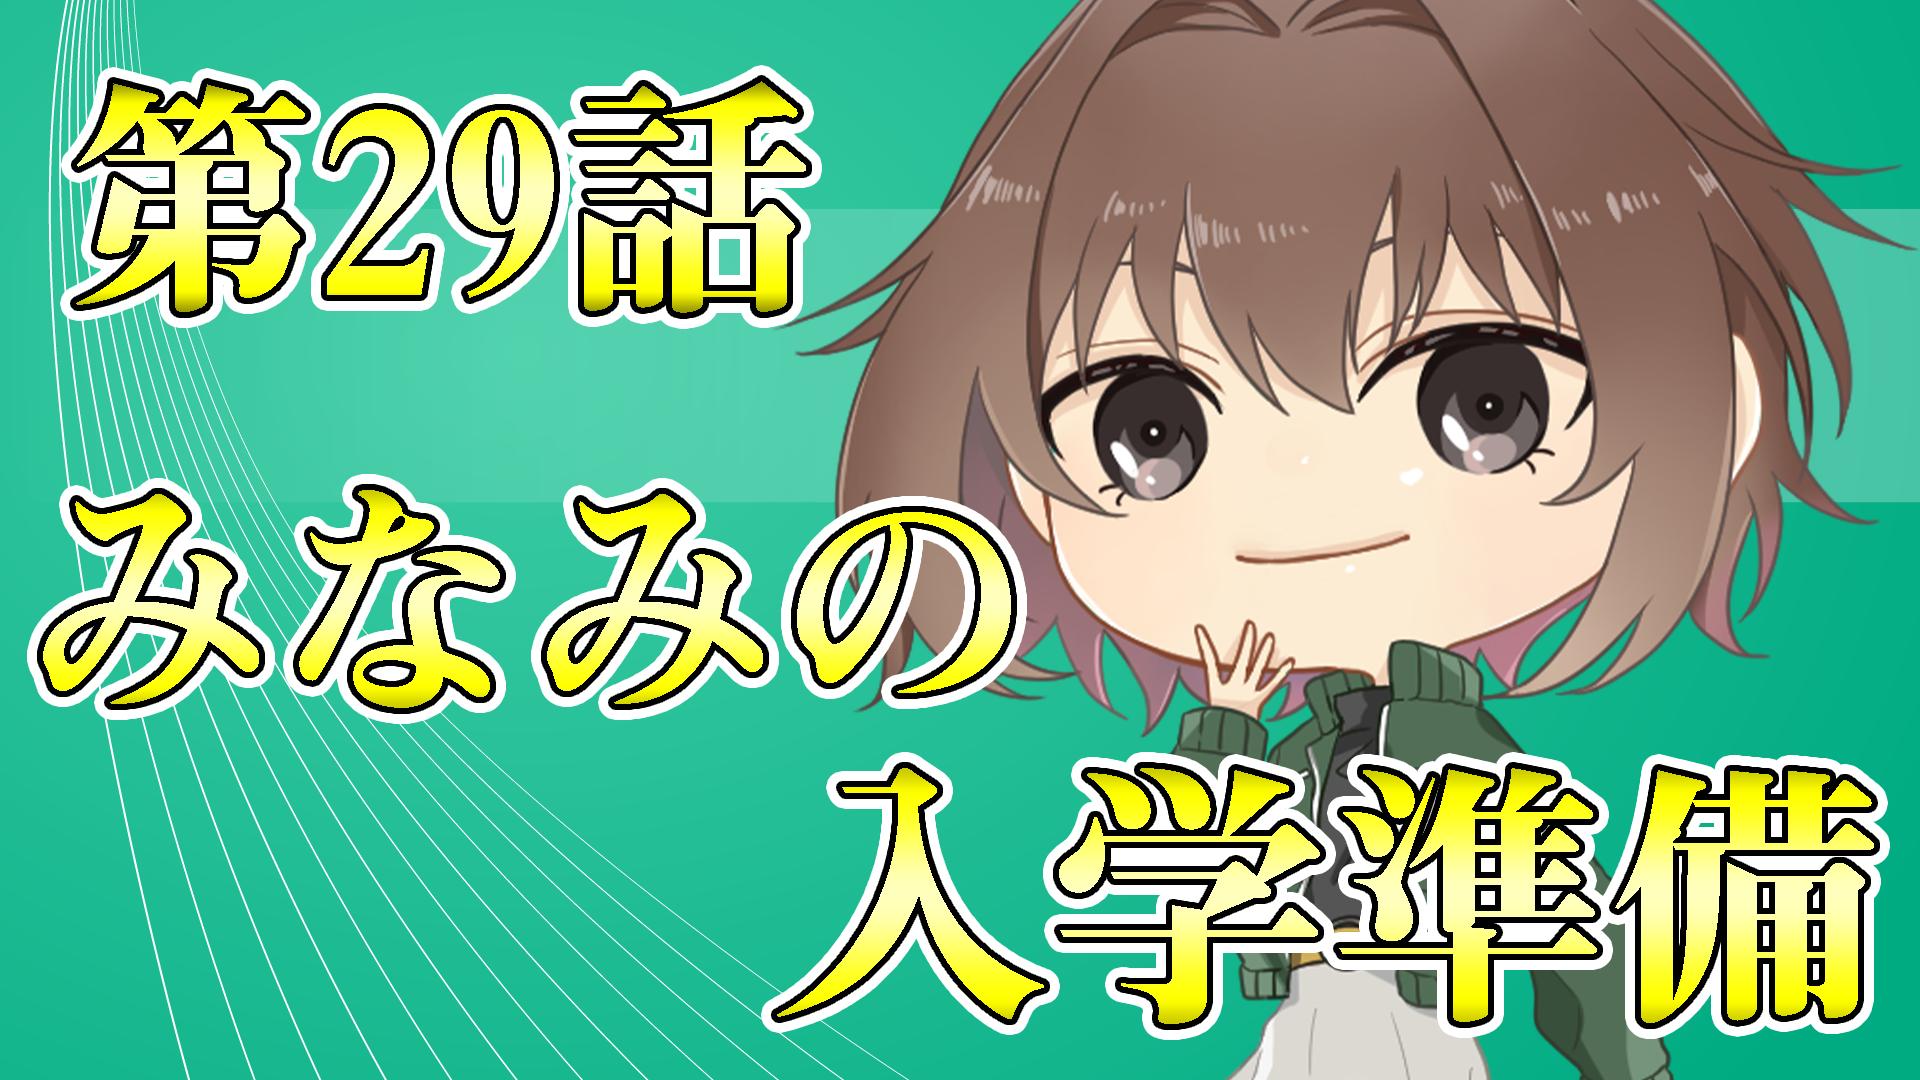 【YouTubeアニメ】第29話「みなみの入学準備」